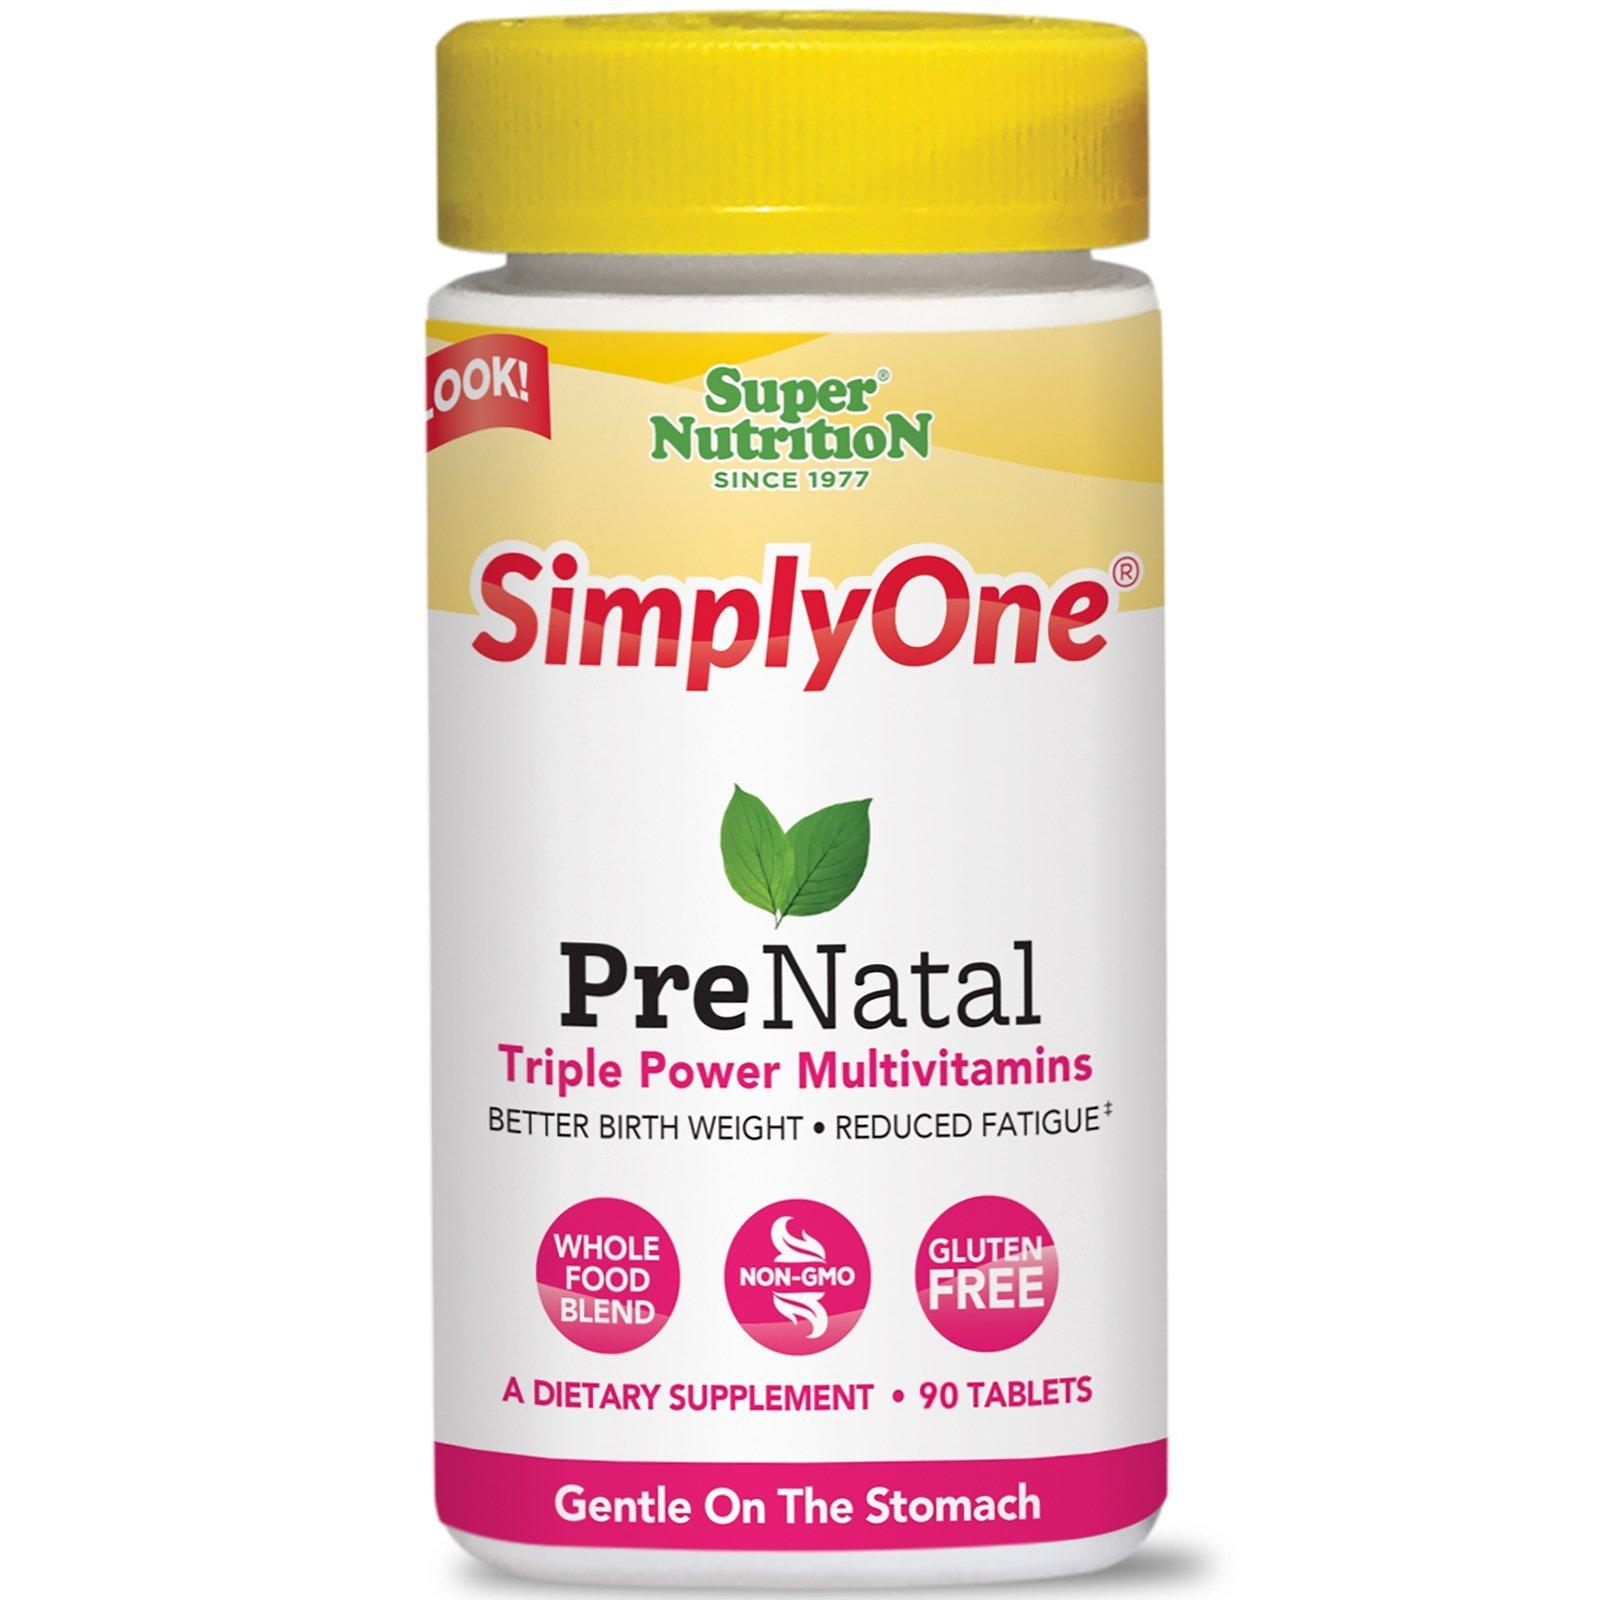 Super Nutrition, Simply One Prenatal, 90 Tablets